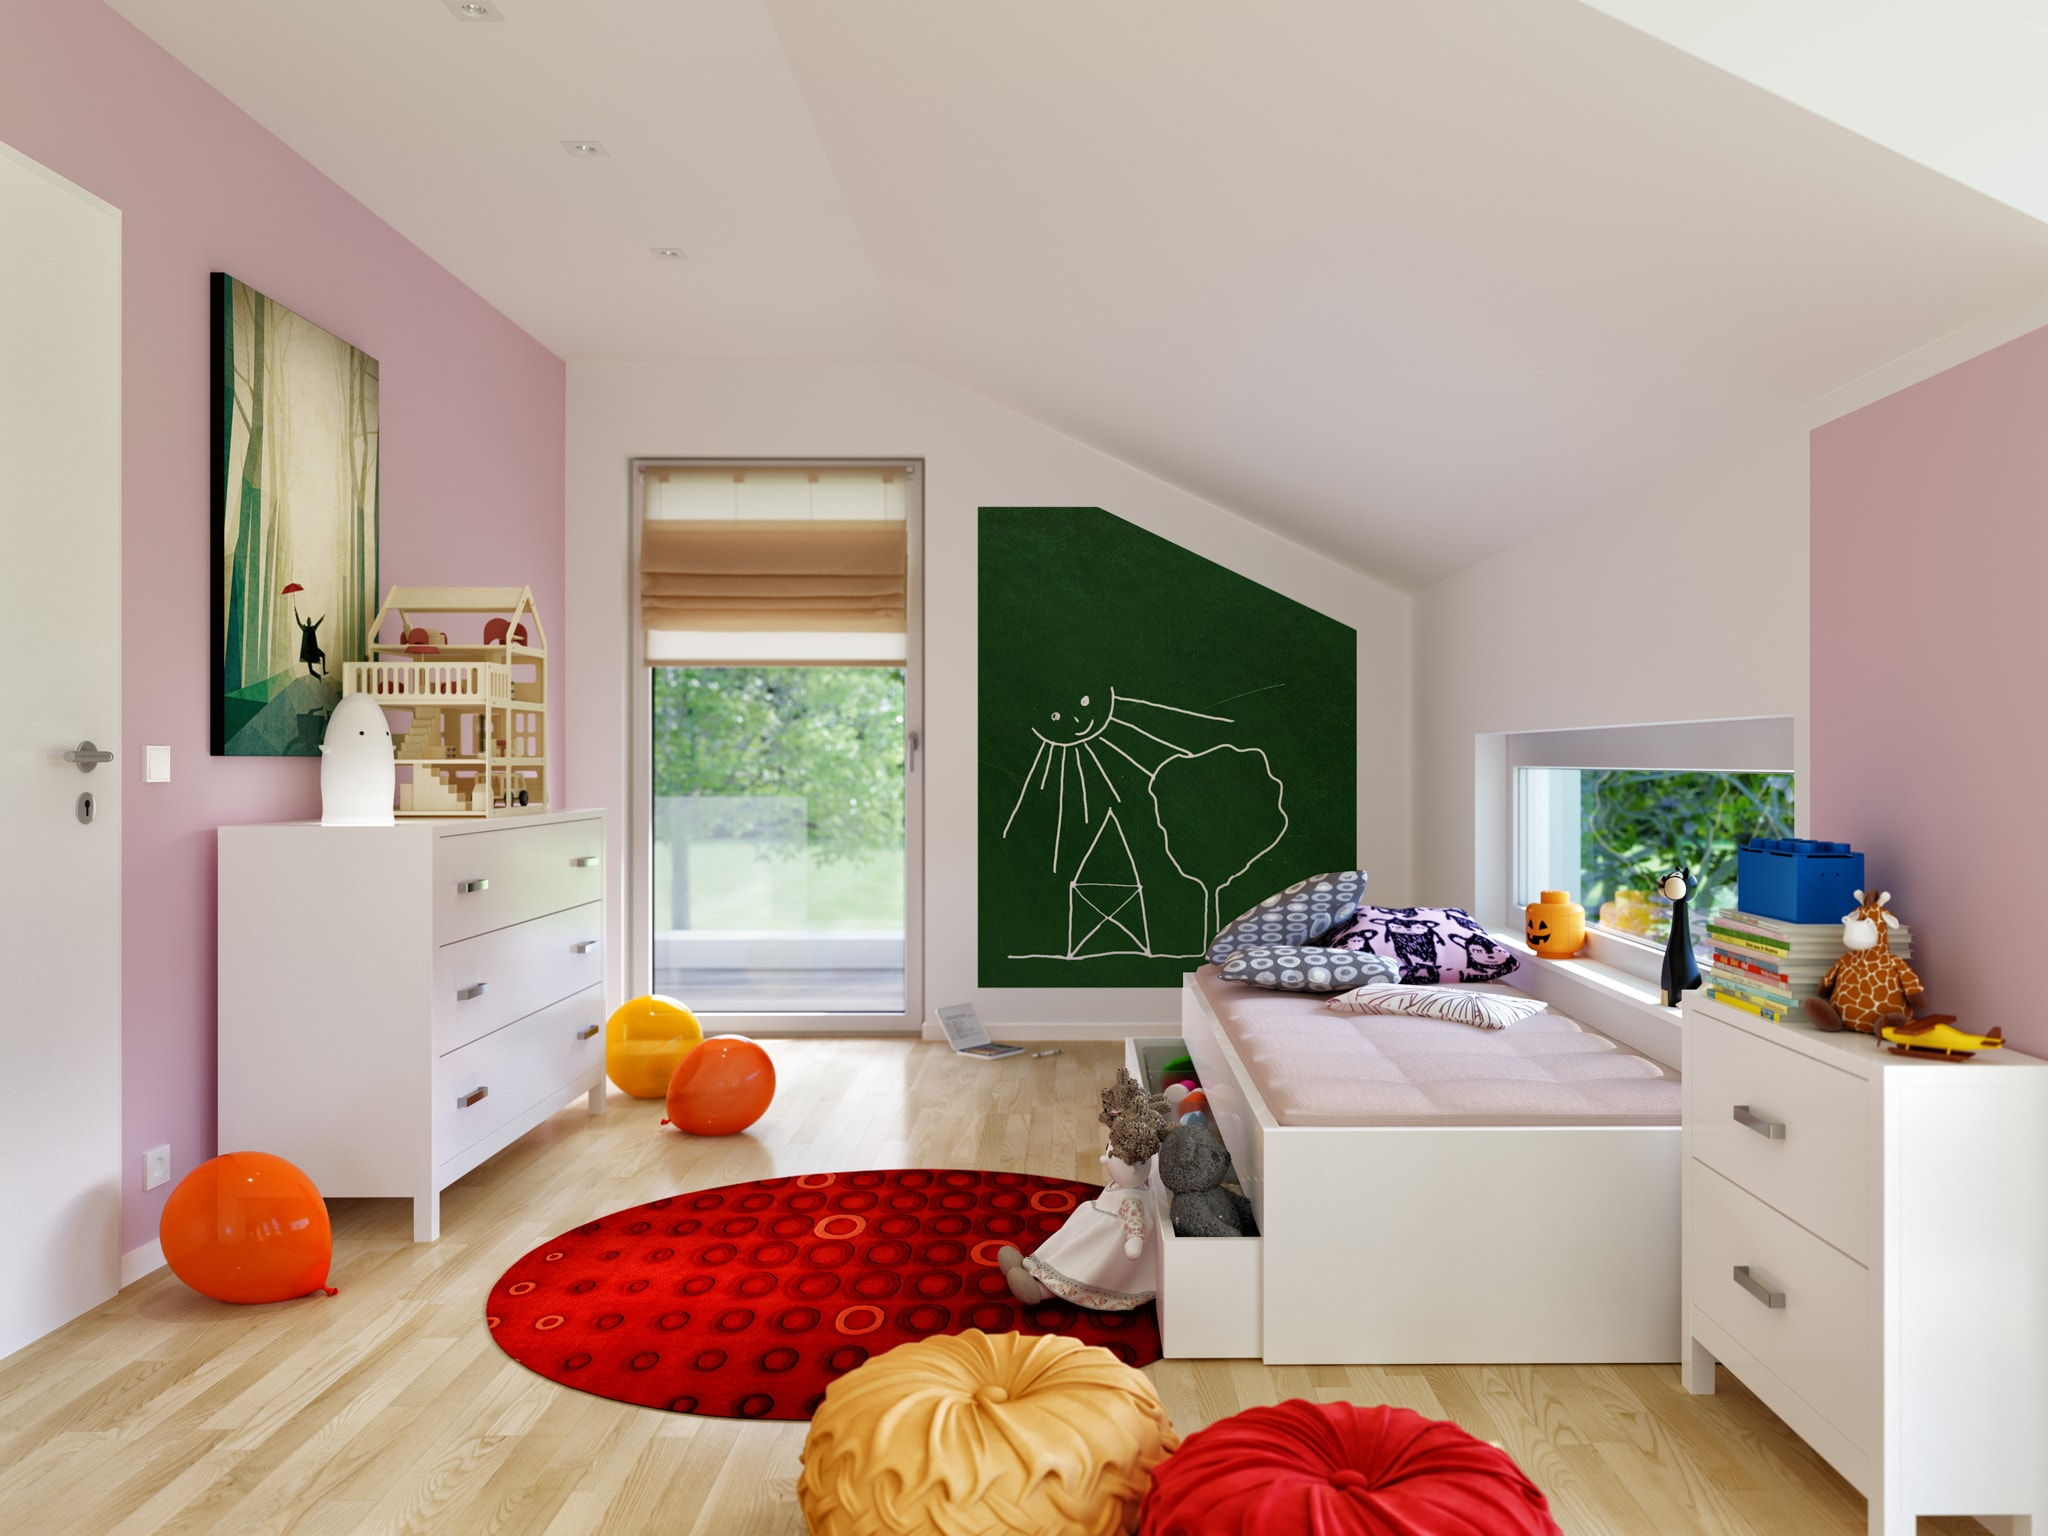 Kinderzimmer Ideen mit Dachschräge - Haus Inneneinrichtung modern Bien Zenker Fertighaus FANTASTIC 162 V2 - HausbauDirekt.de